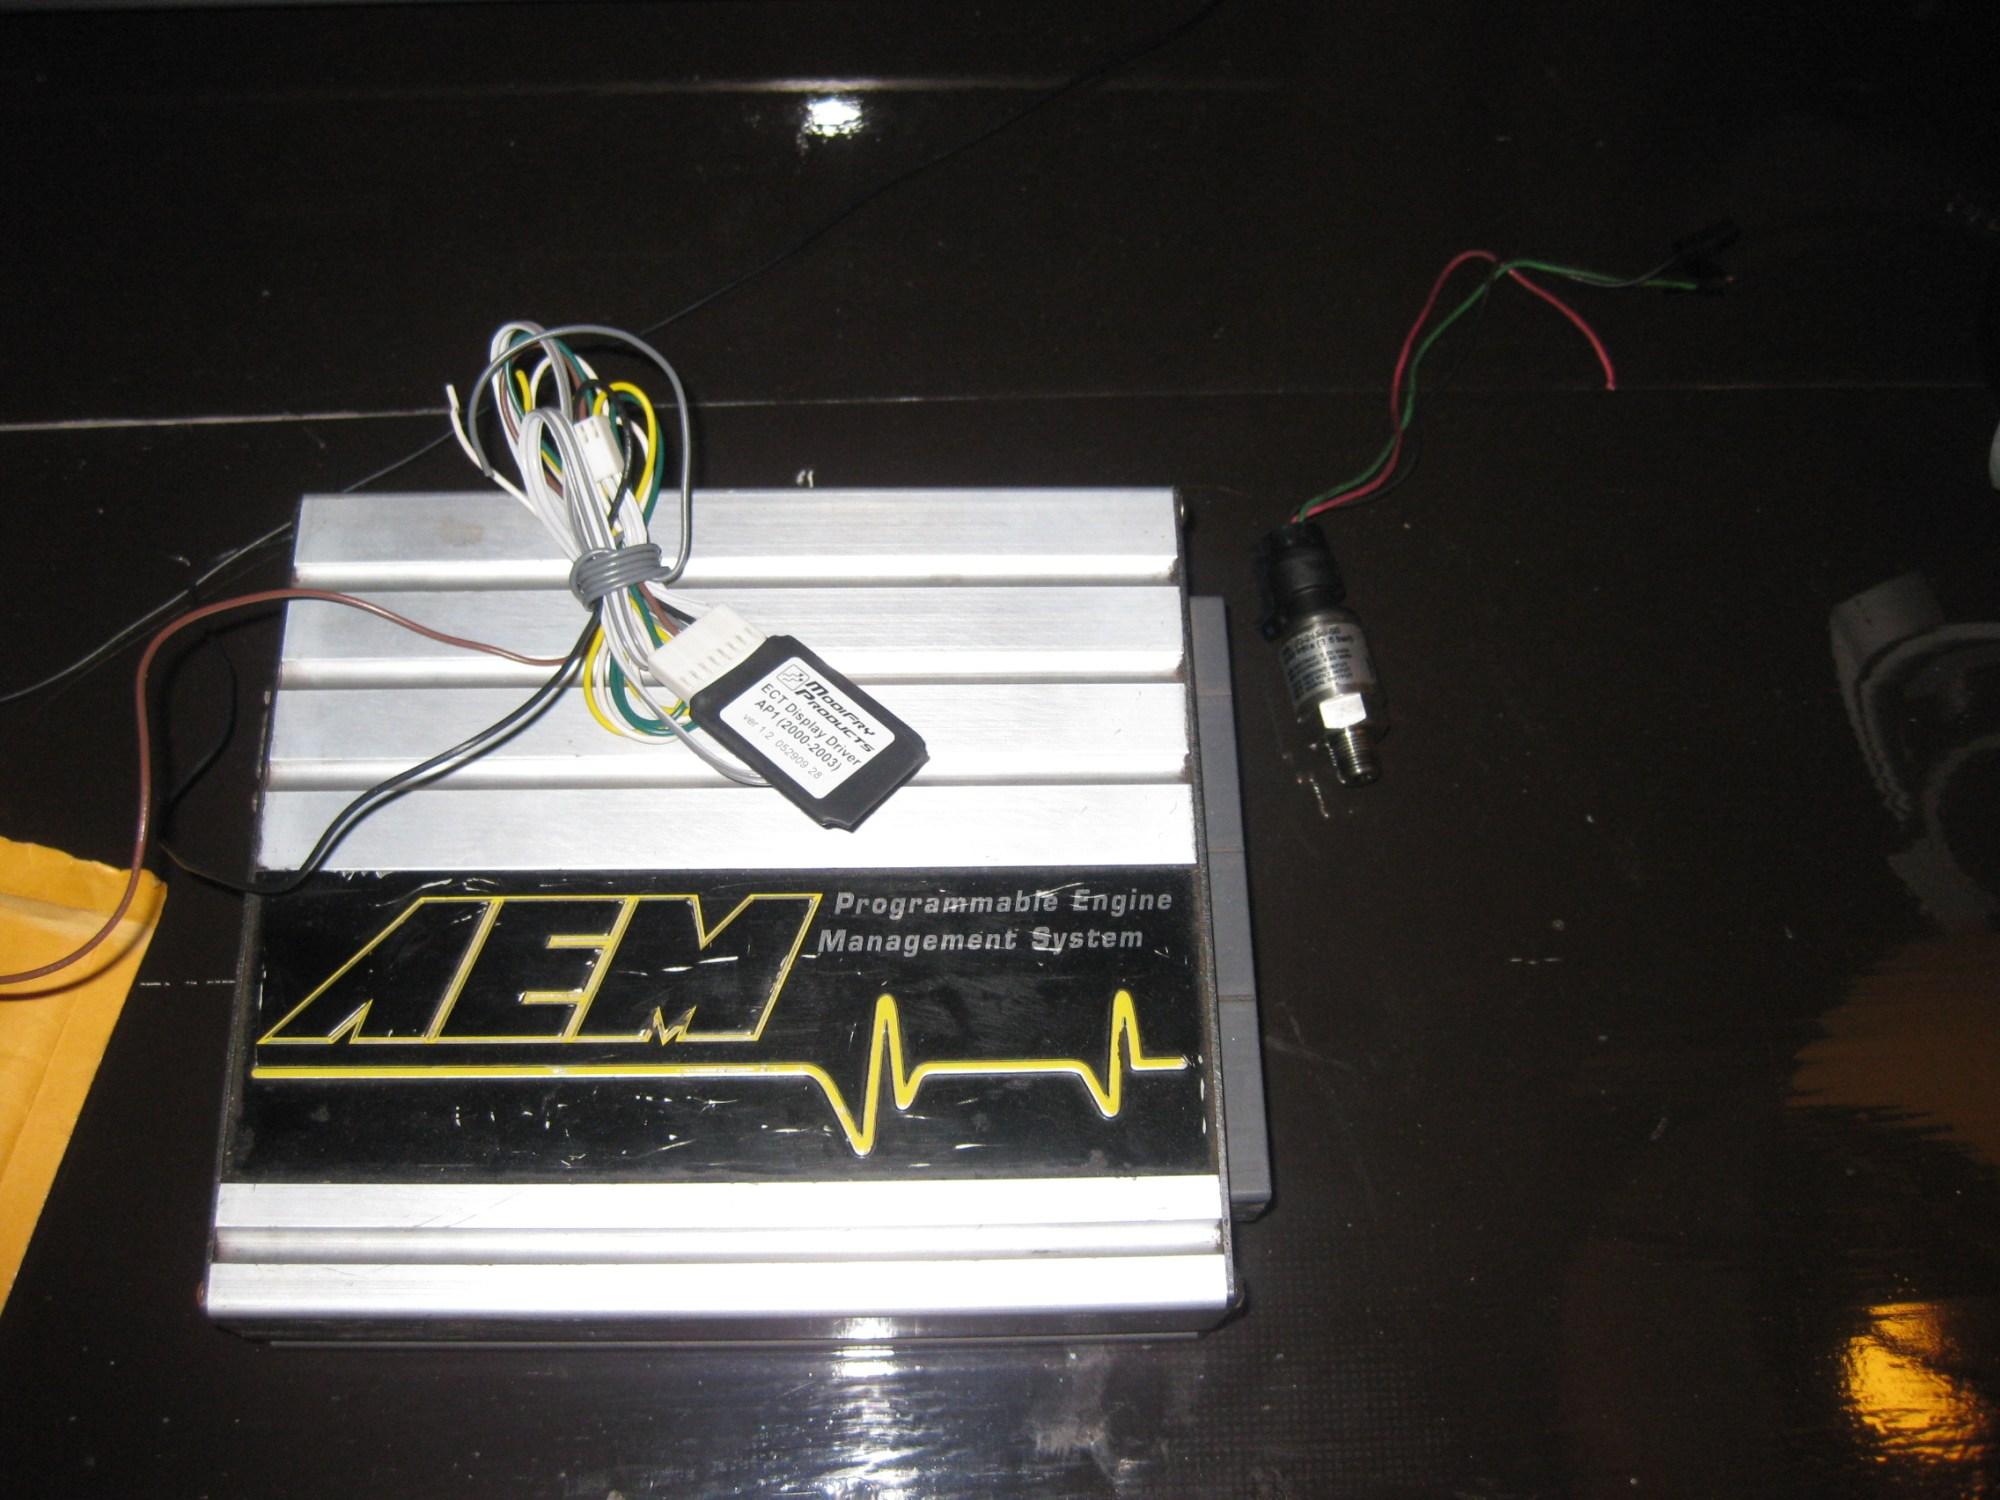 hight resolution of fs aem ems 1012 aem 3 5 bar map sensor img 1268 jpg